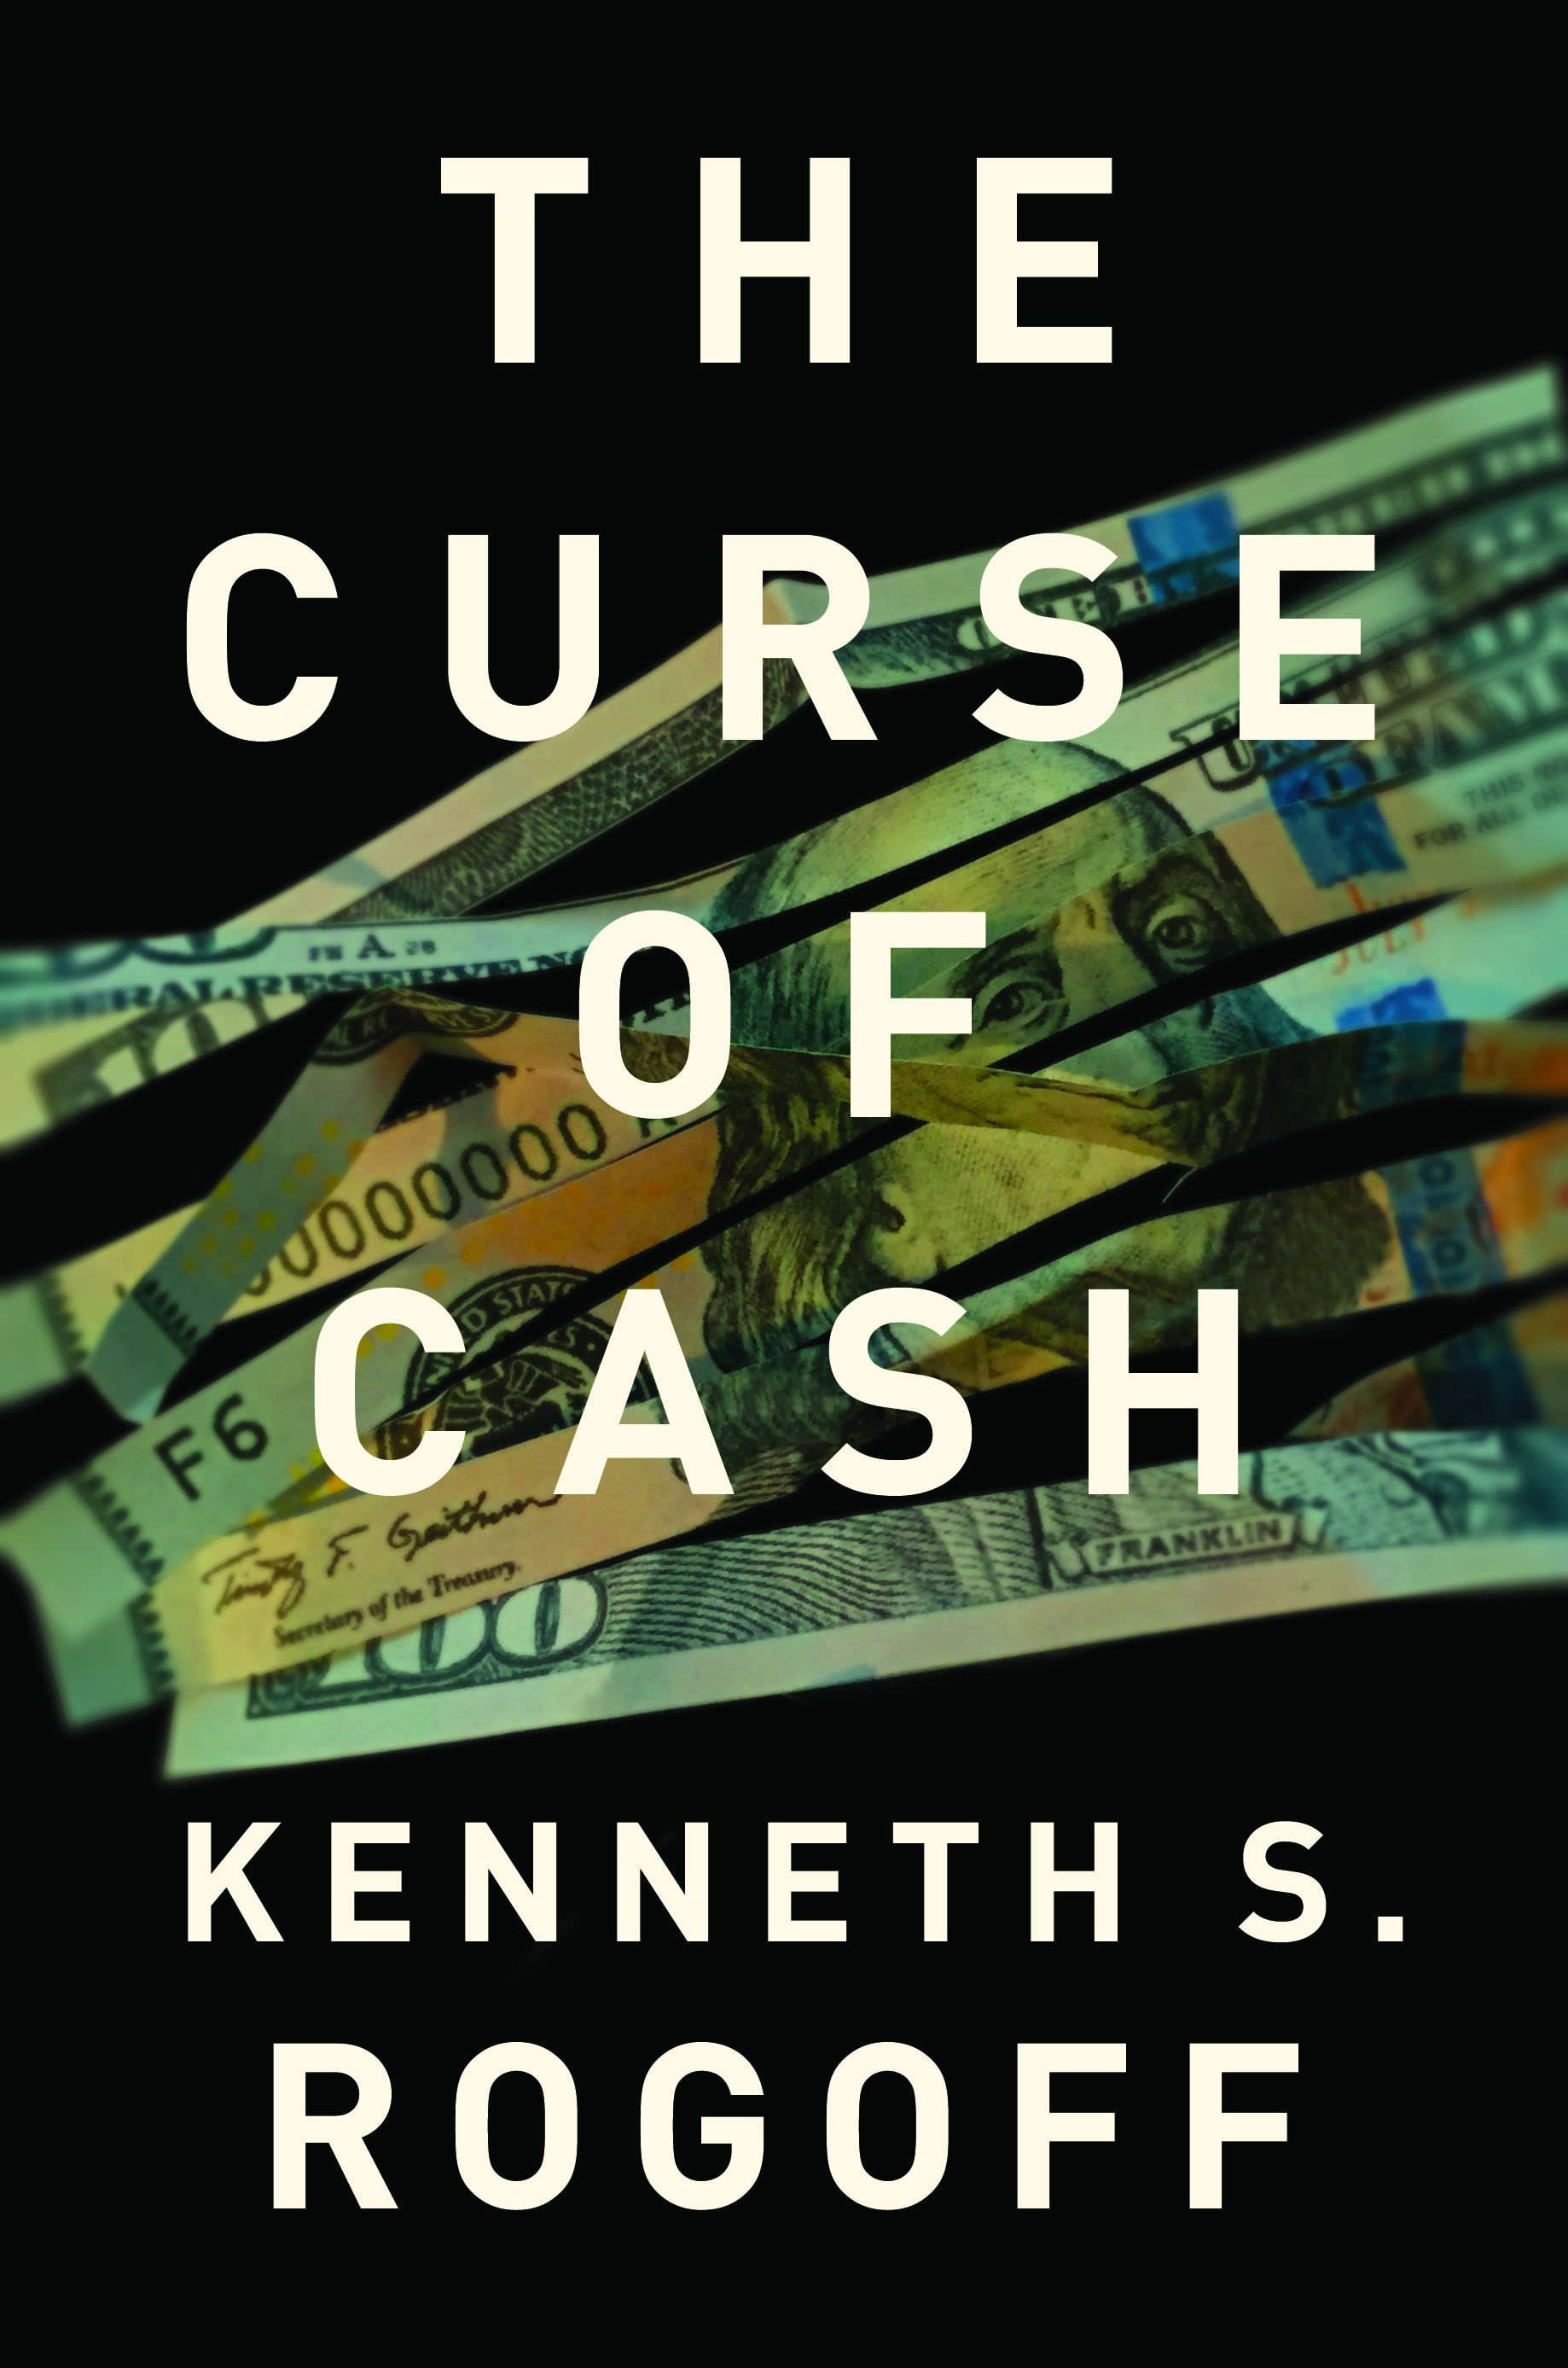 The Curse of Cash by Kenneth Rogoff